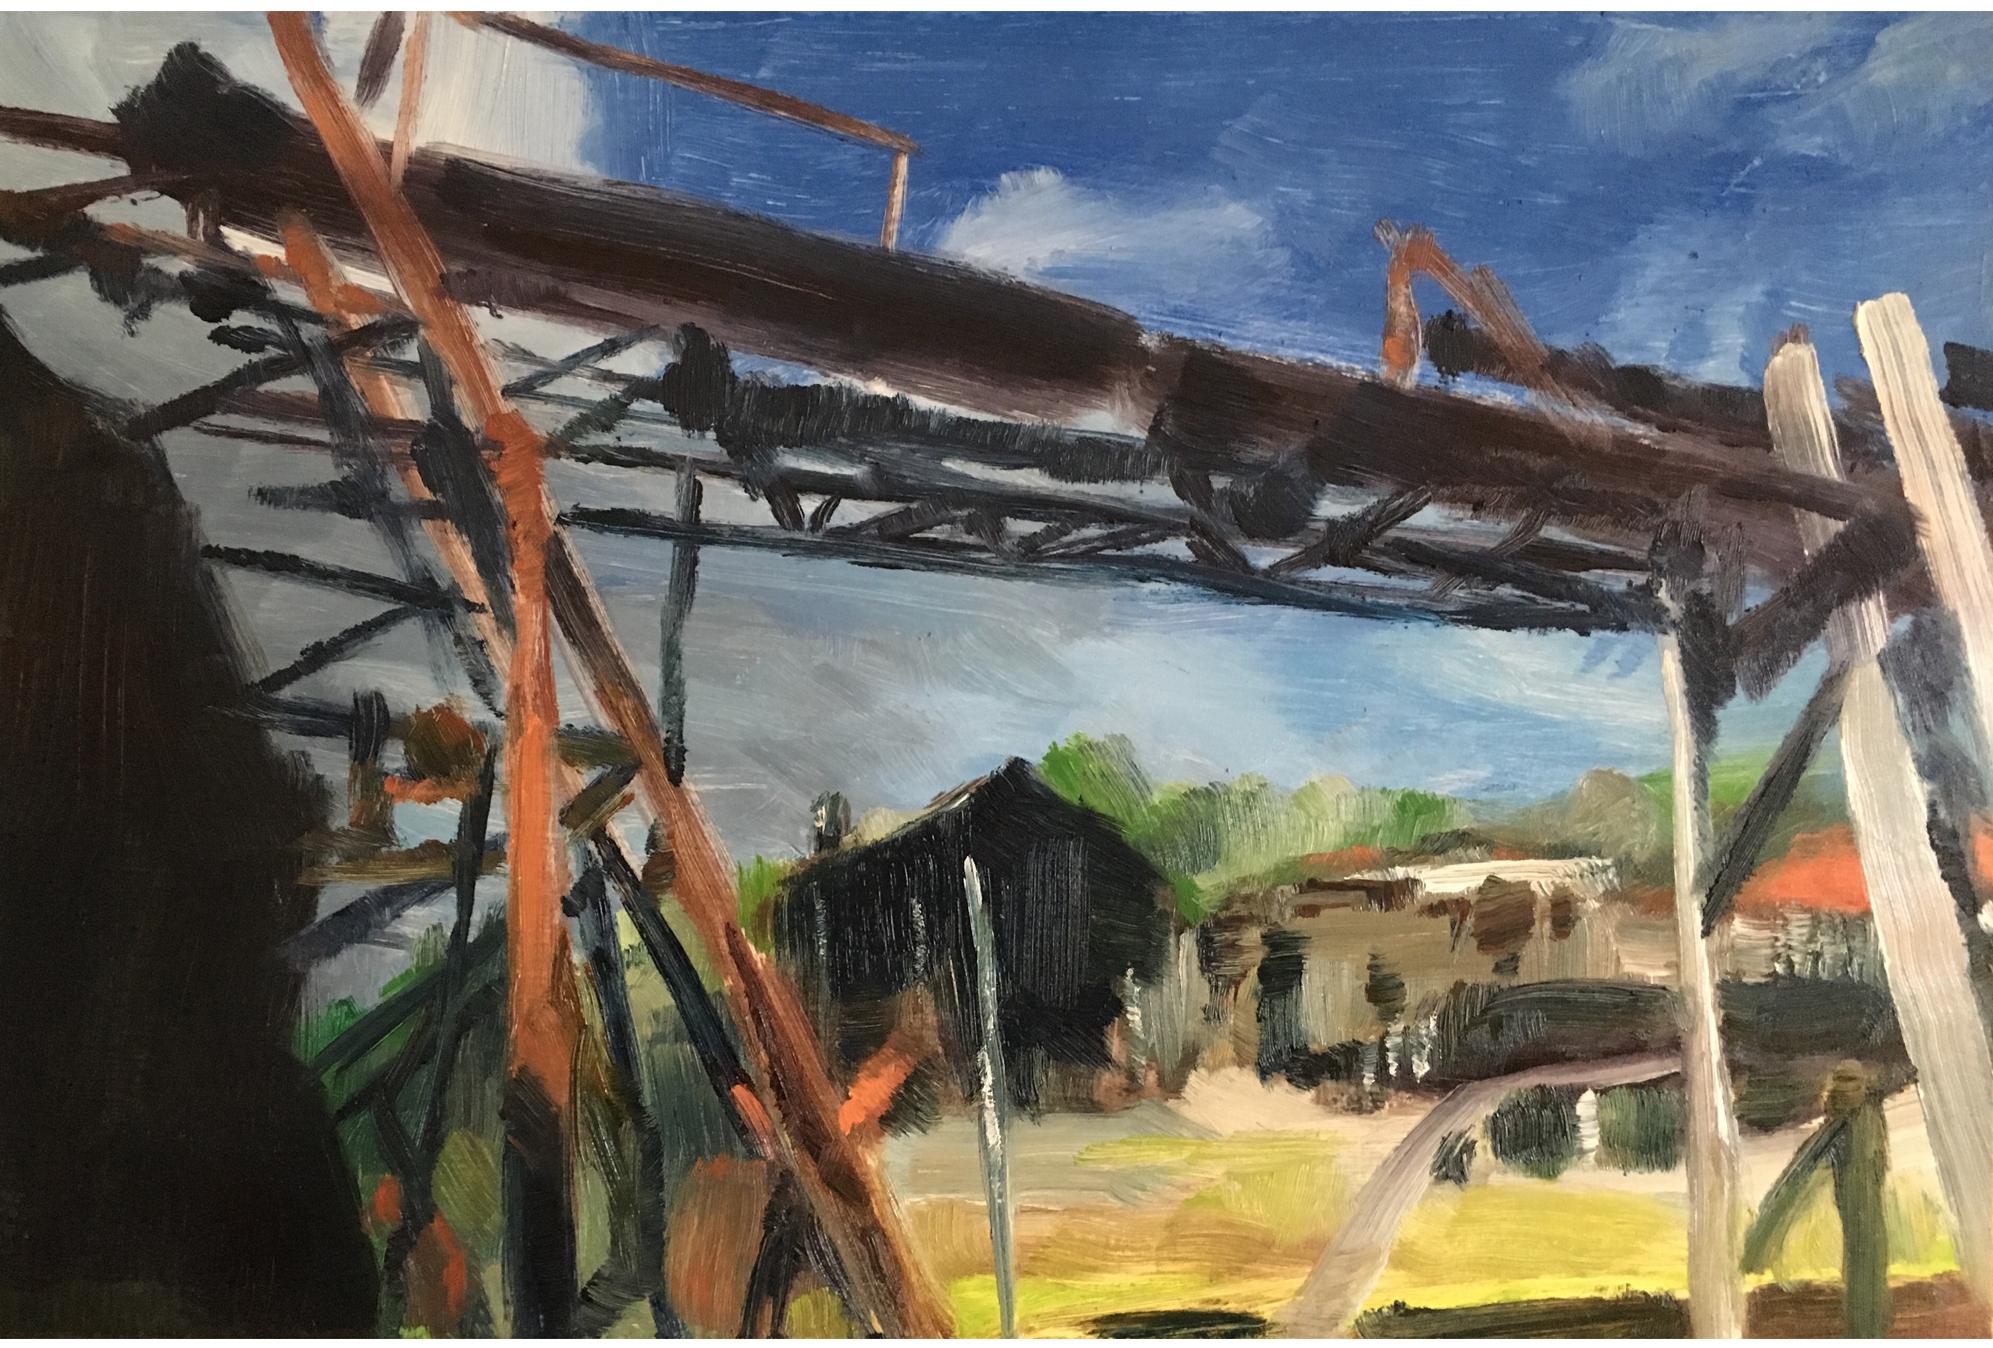 Harvey Mullen, Donnelly River Sawmill Gantry